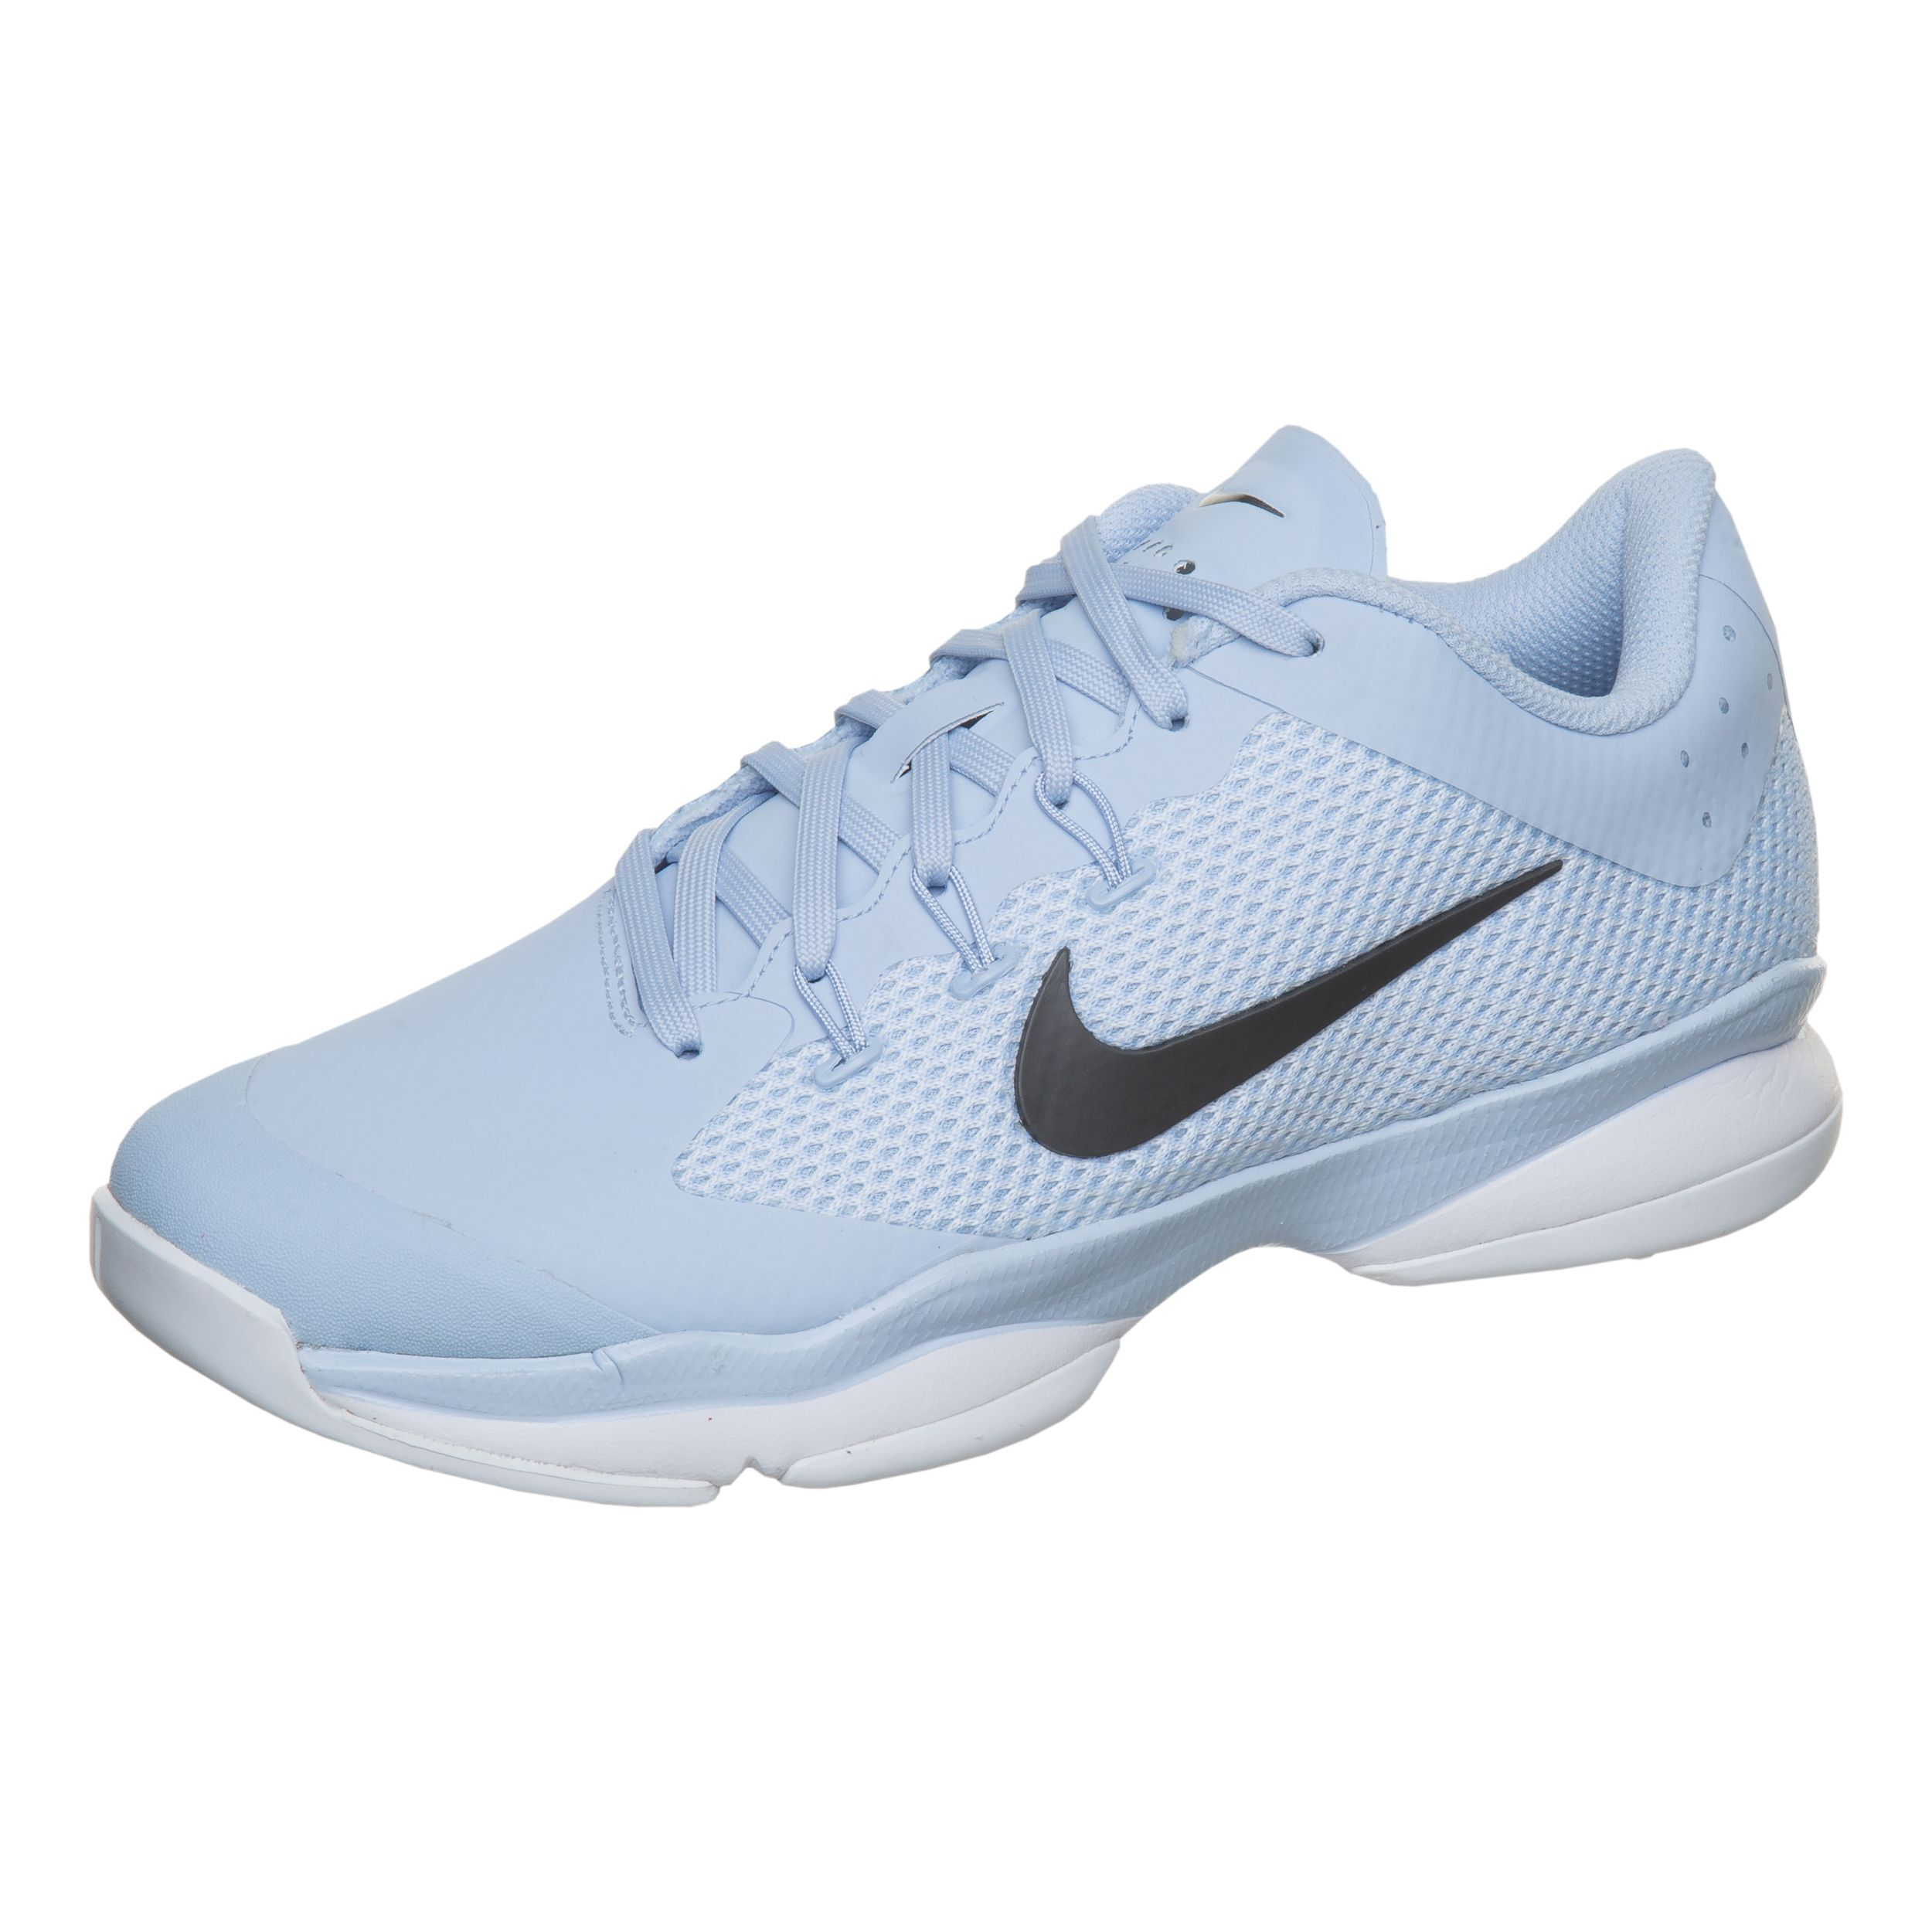 Nike Air Zoom Ultra Carpet Teppichschuh Damen Hellblau